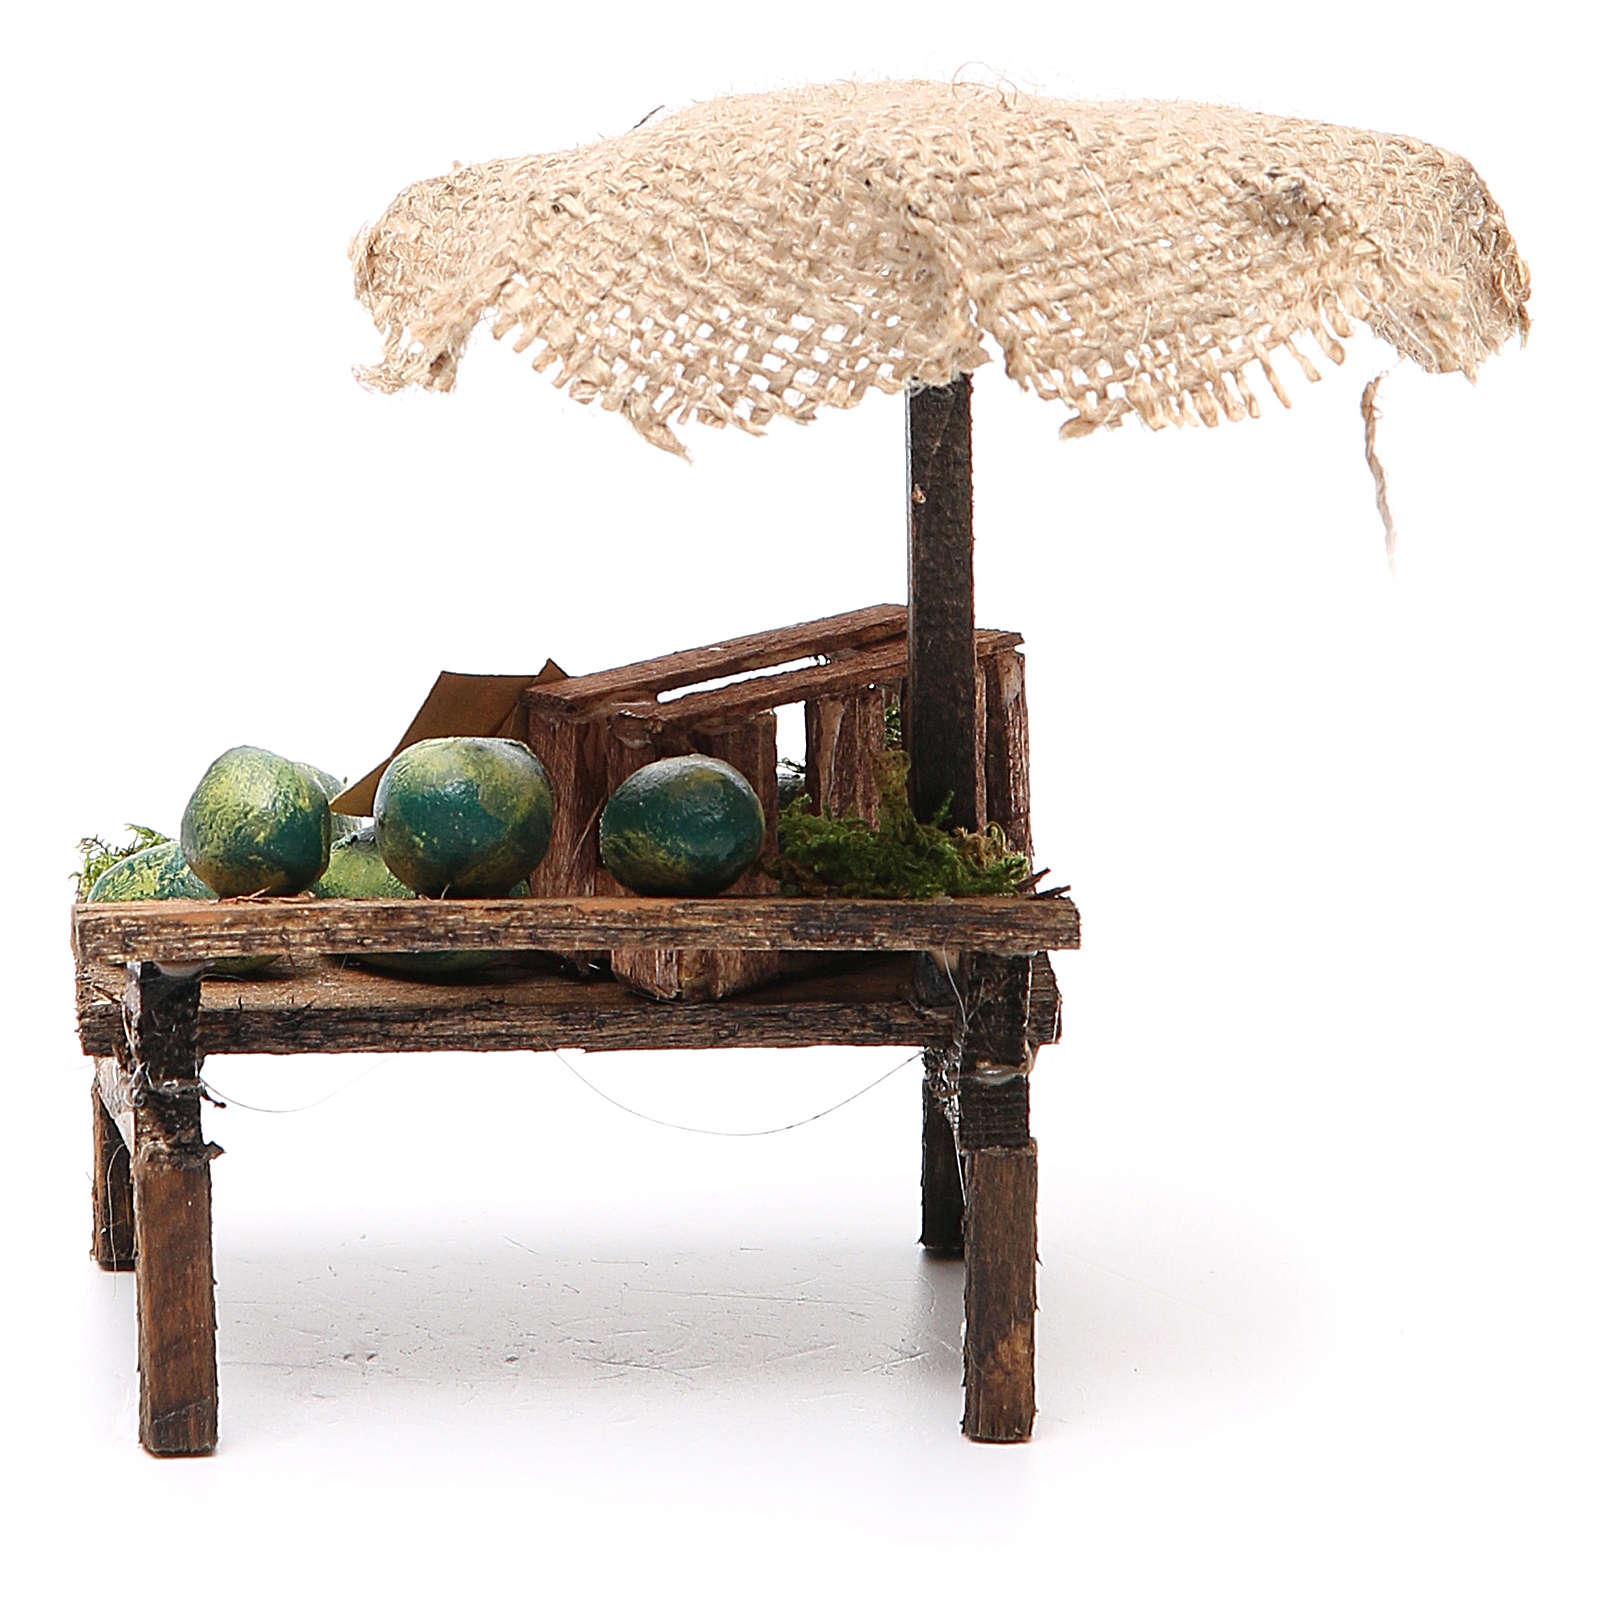 Banco presepe con ombrello angurie 12x10x12 cm 4